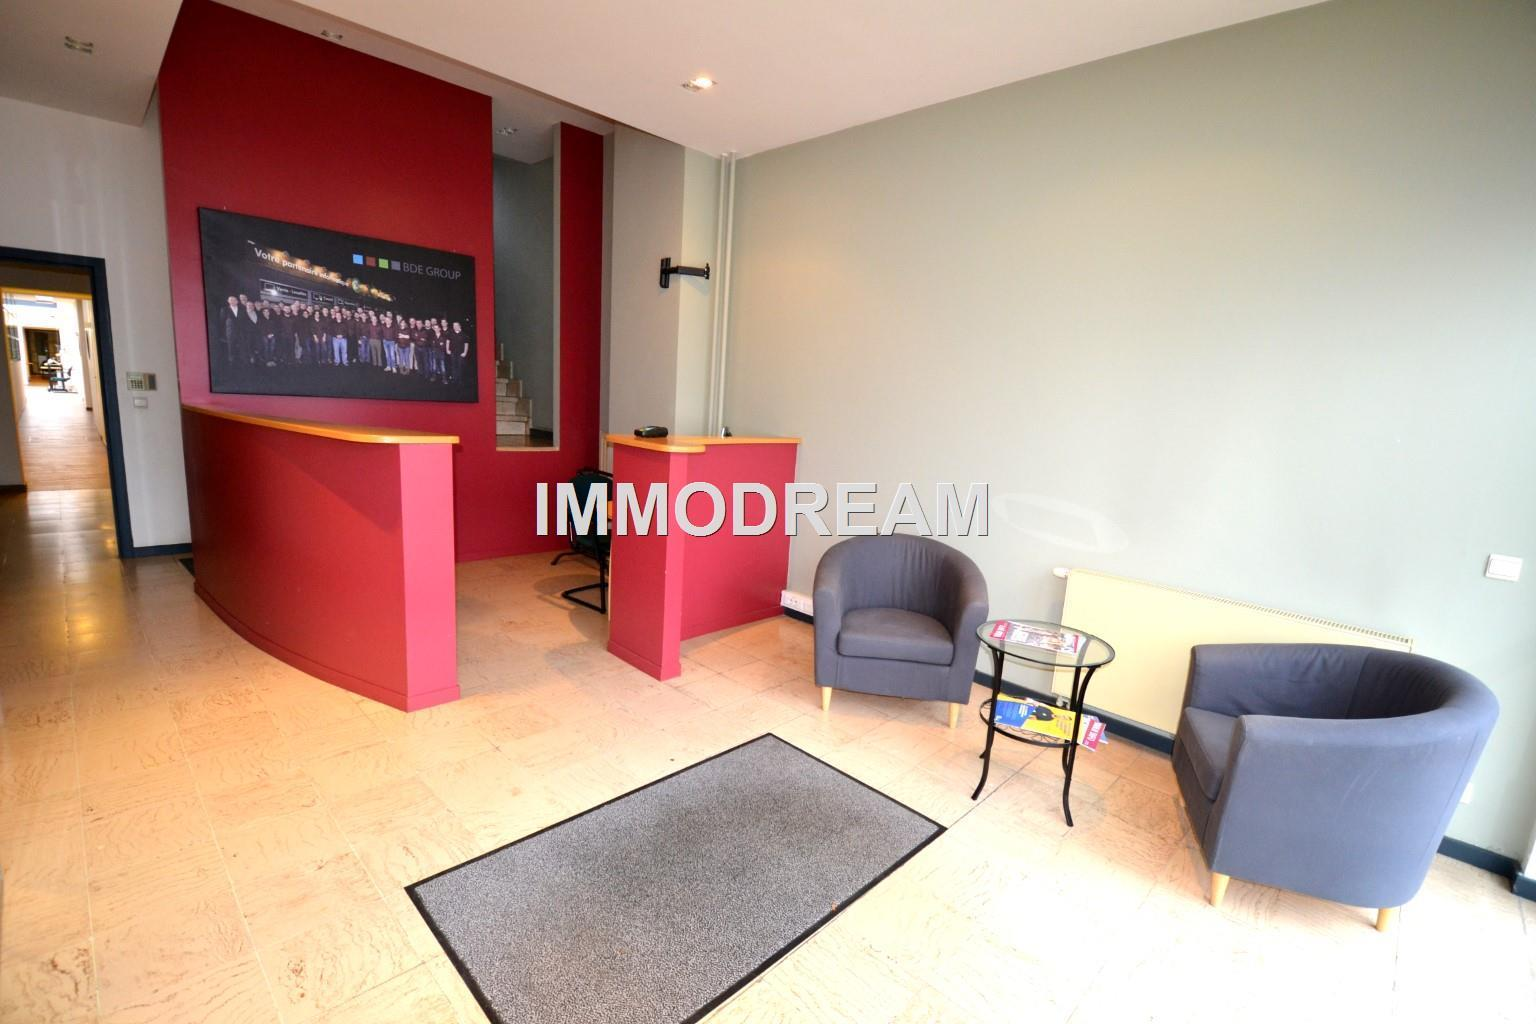 Mixt building off + res. - Woluwe-Saint-Lambert - #4025861-2